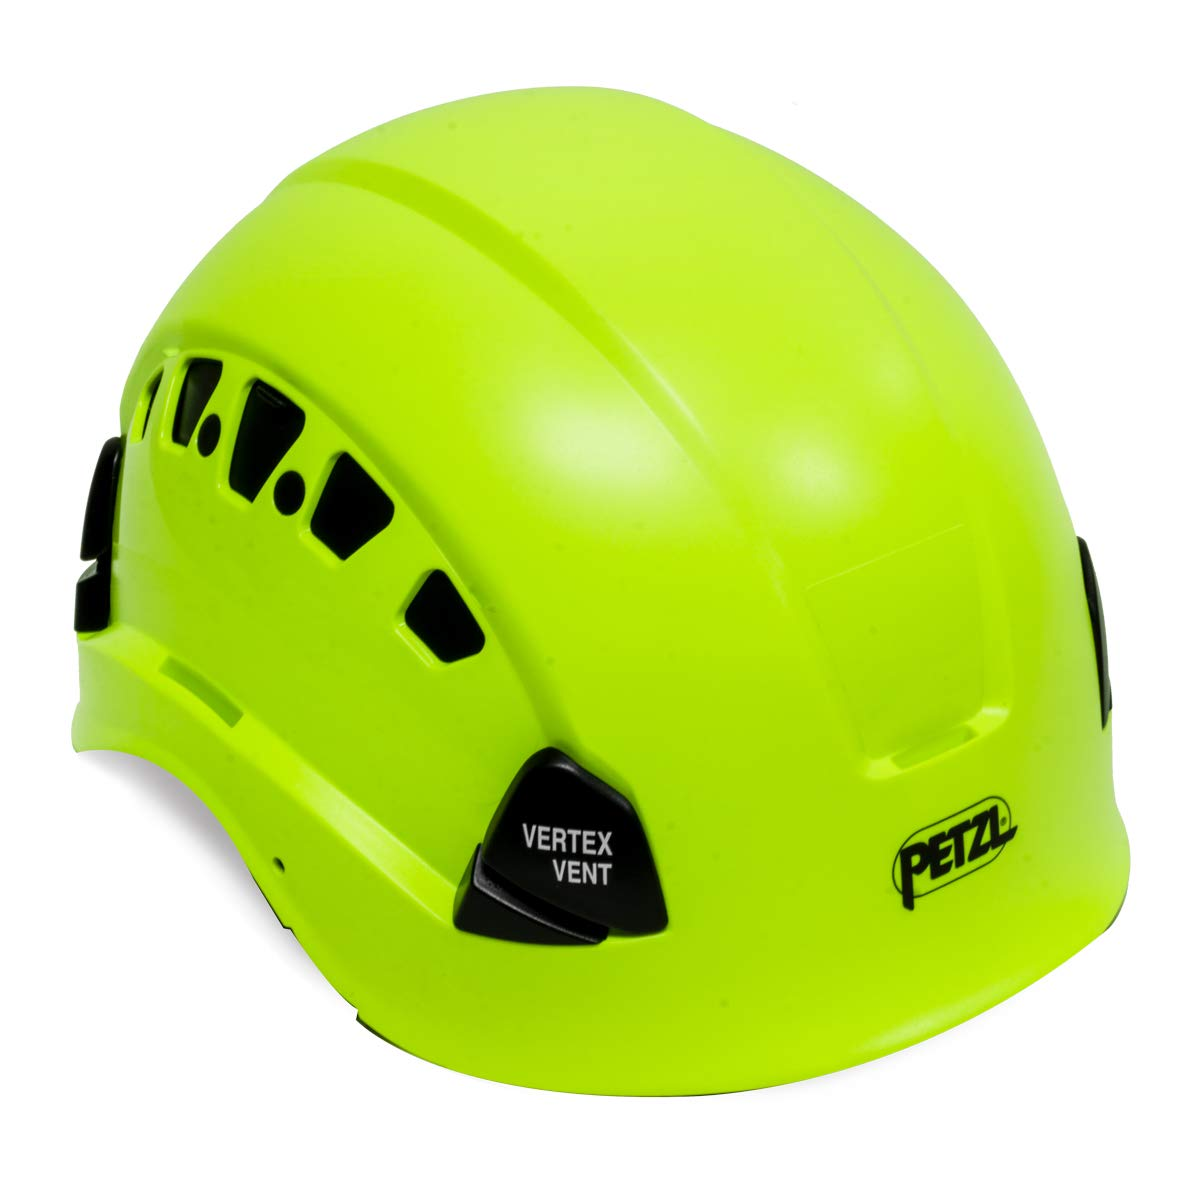 Petzl Vertex Vent Hi-Viz Visibility Yellow Climbing Helmet A10VYAHV